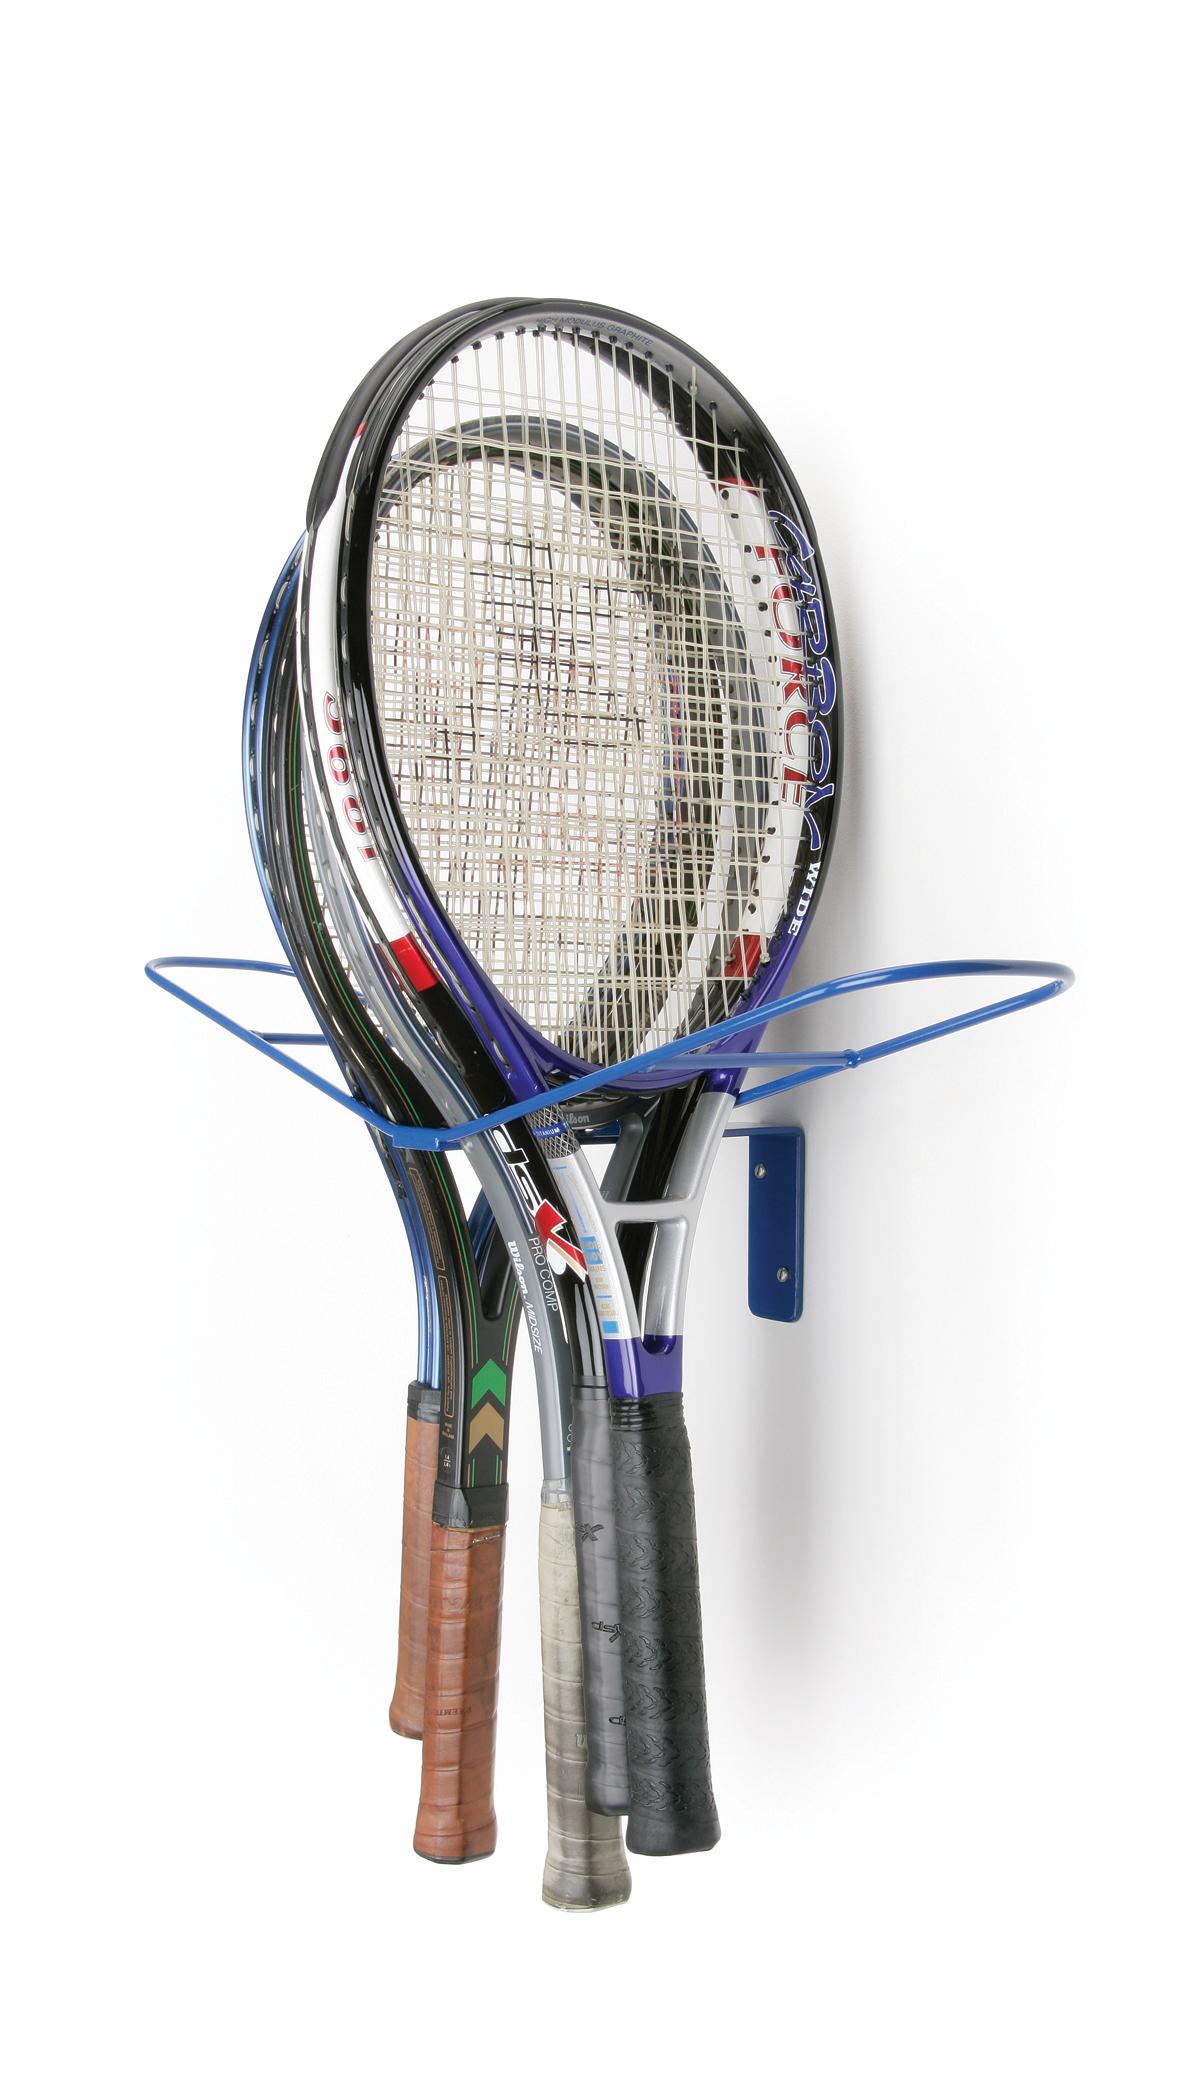 Tennis / Squash Racket Wall Rack